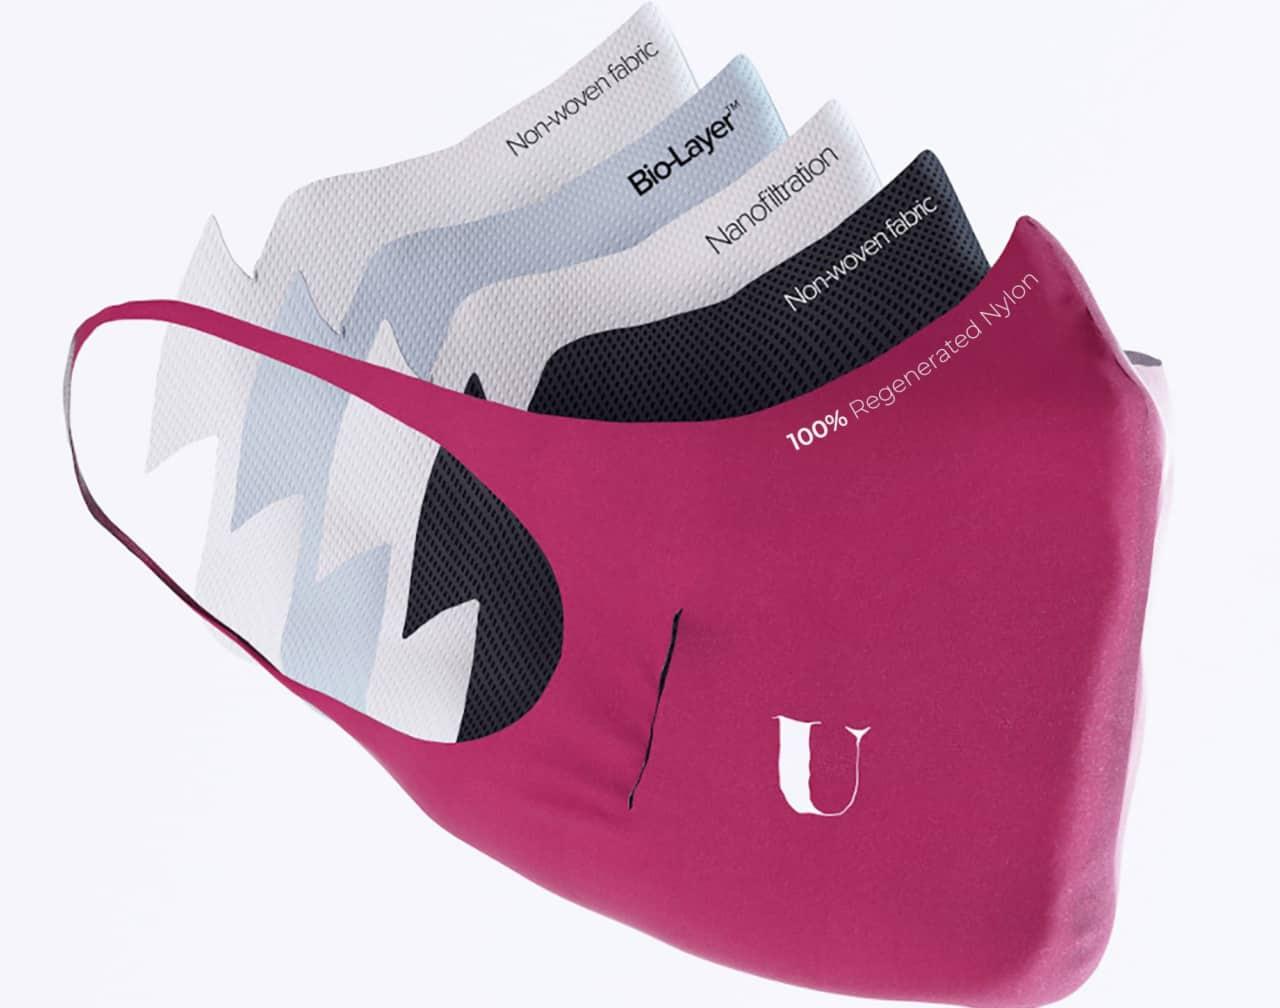 mascherine u-mask denuncia antitrust